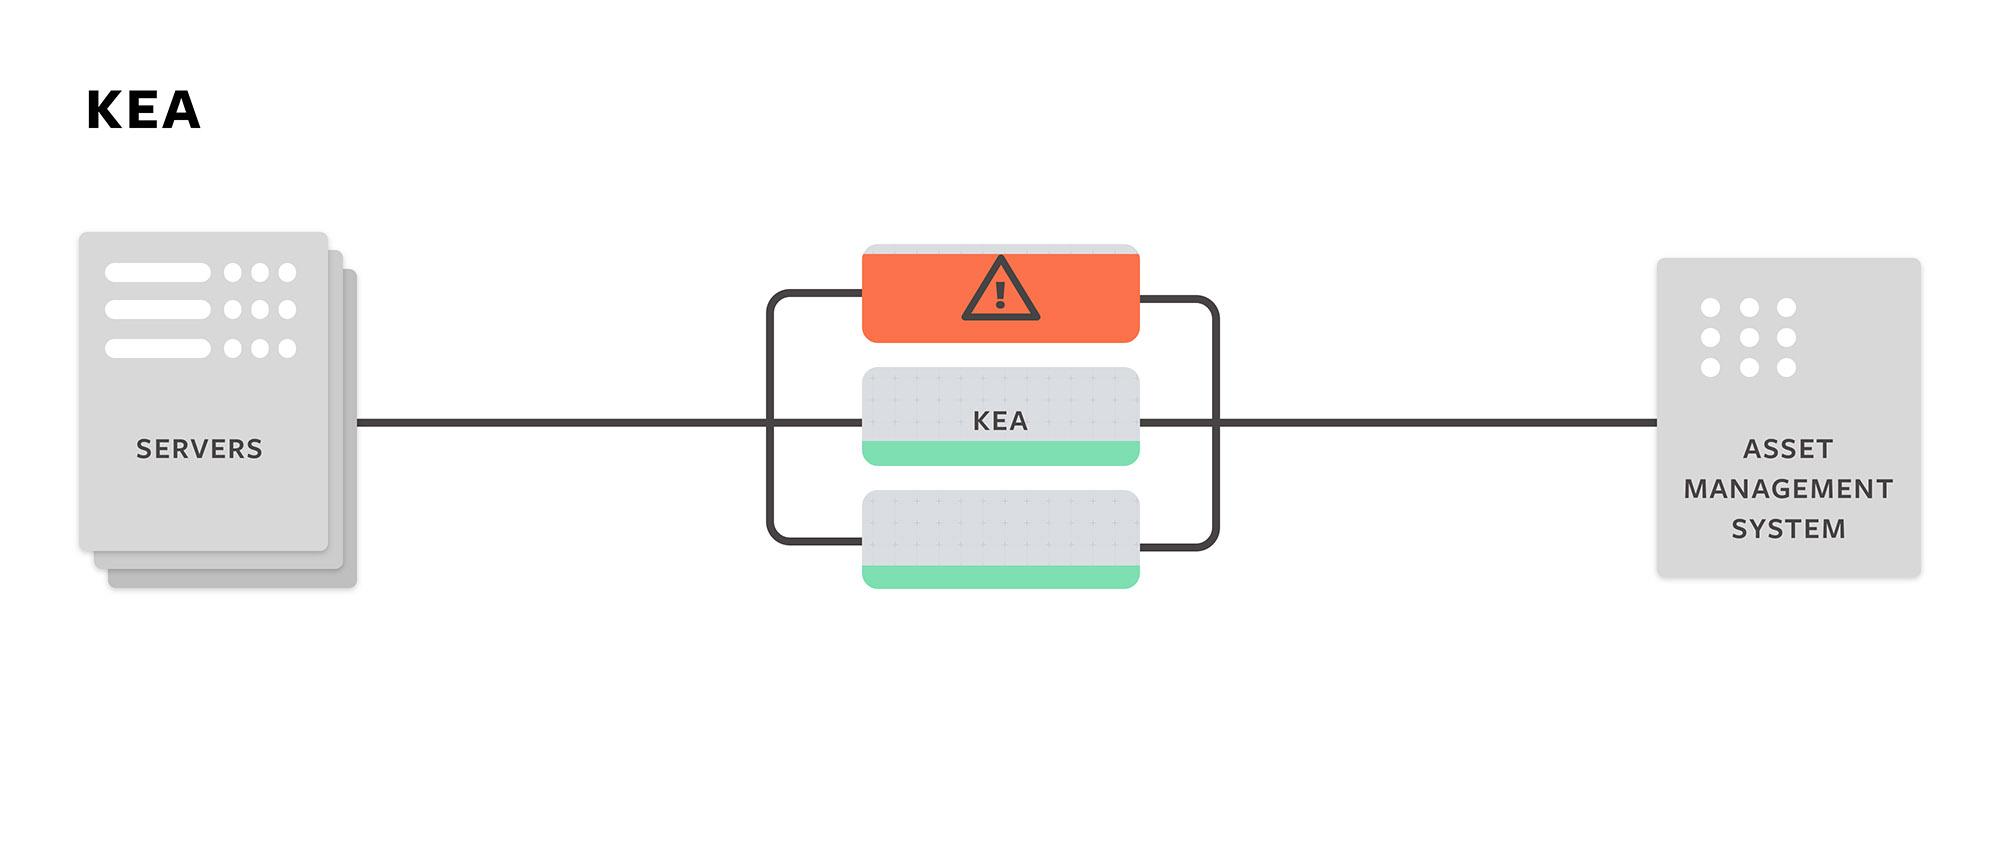 Kea server